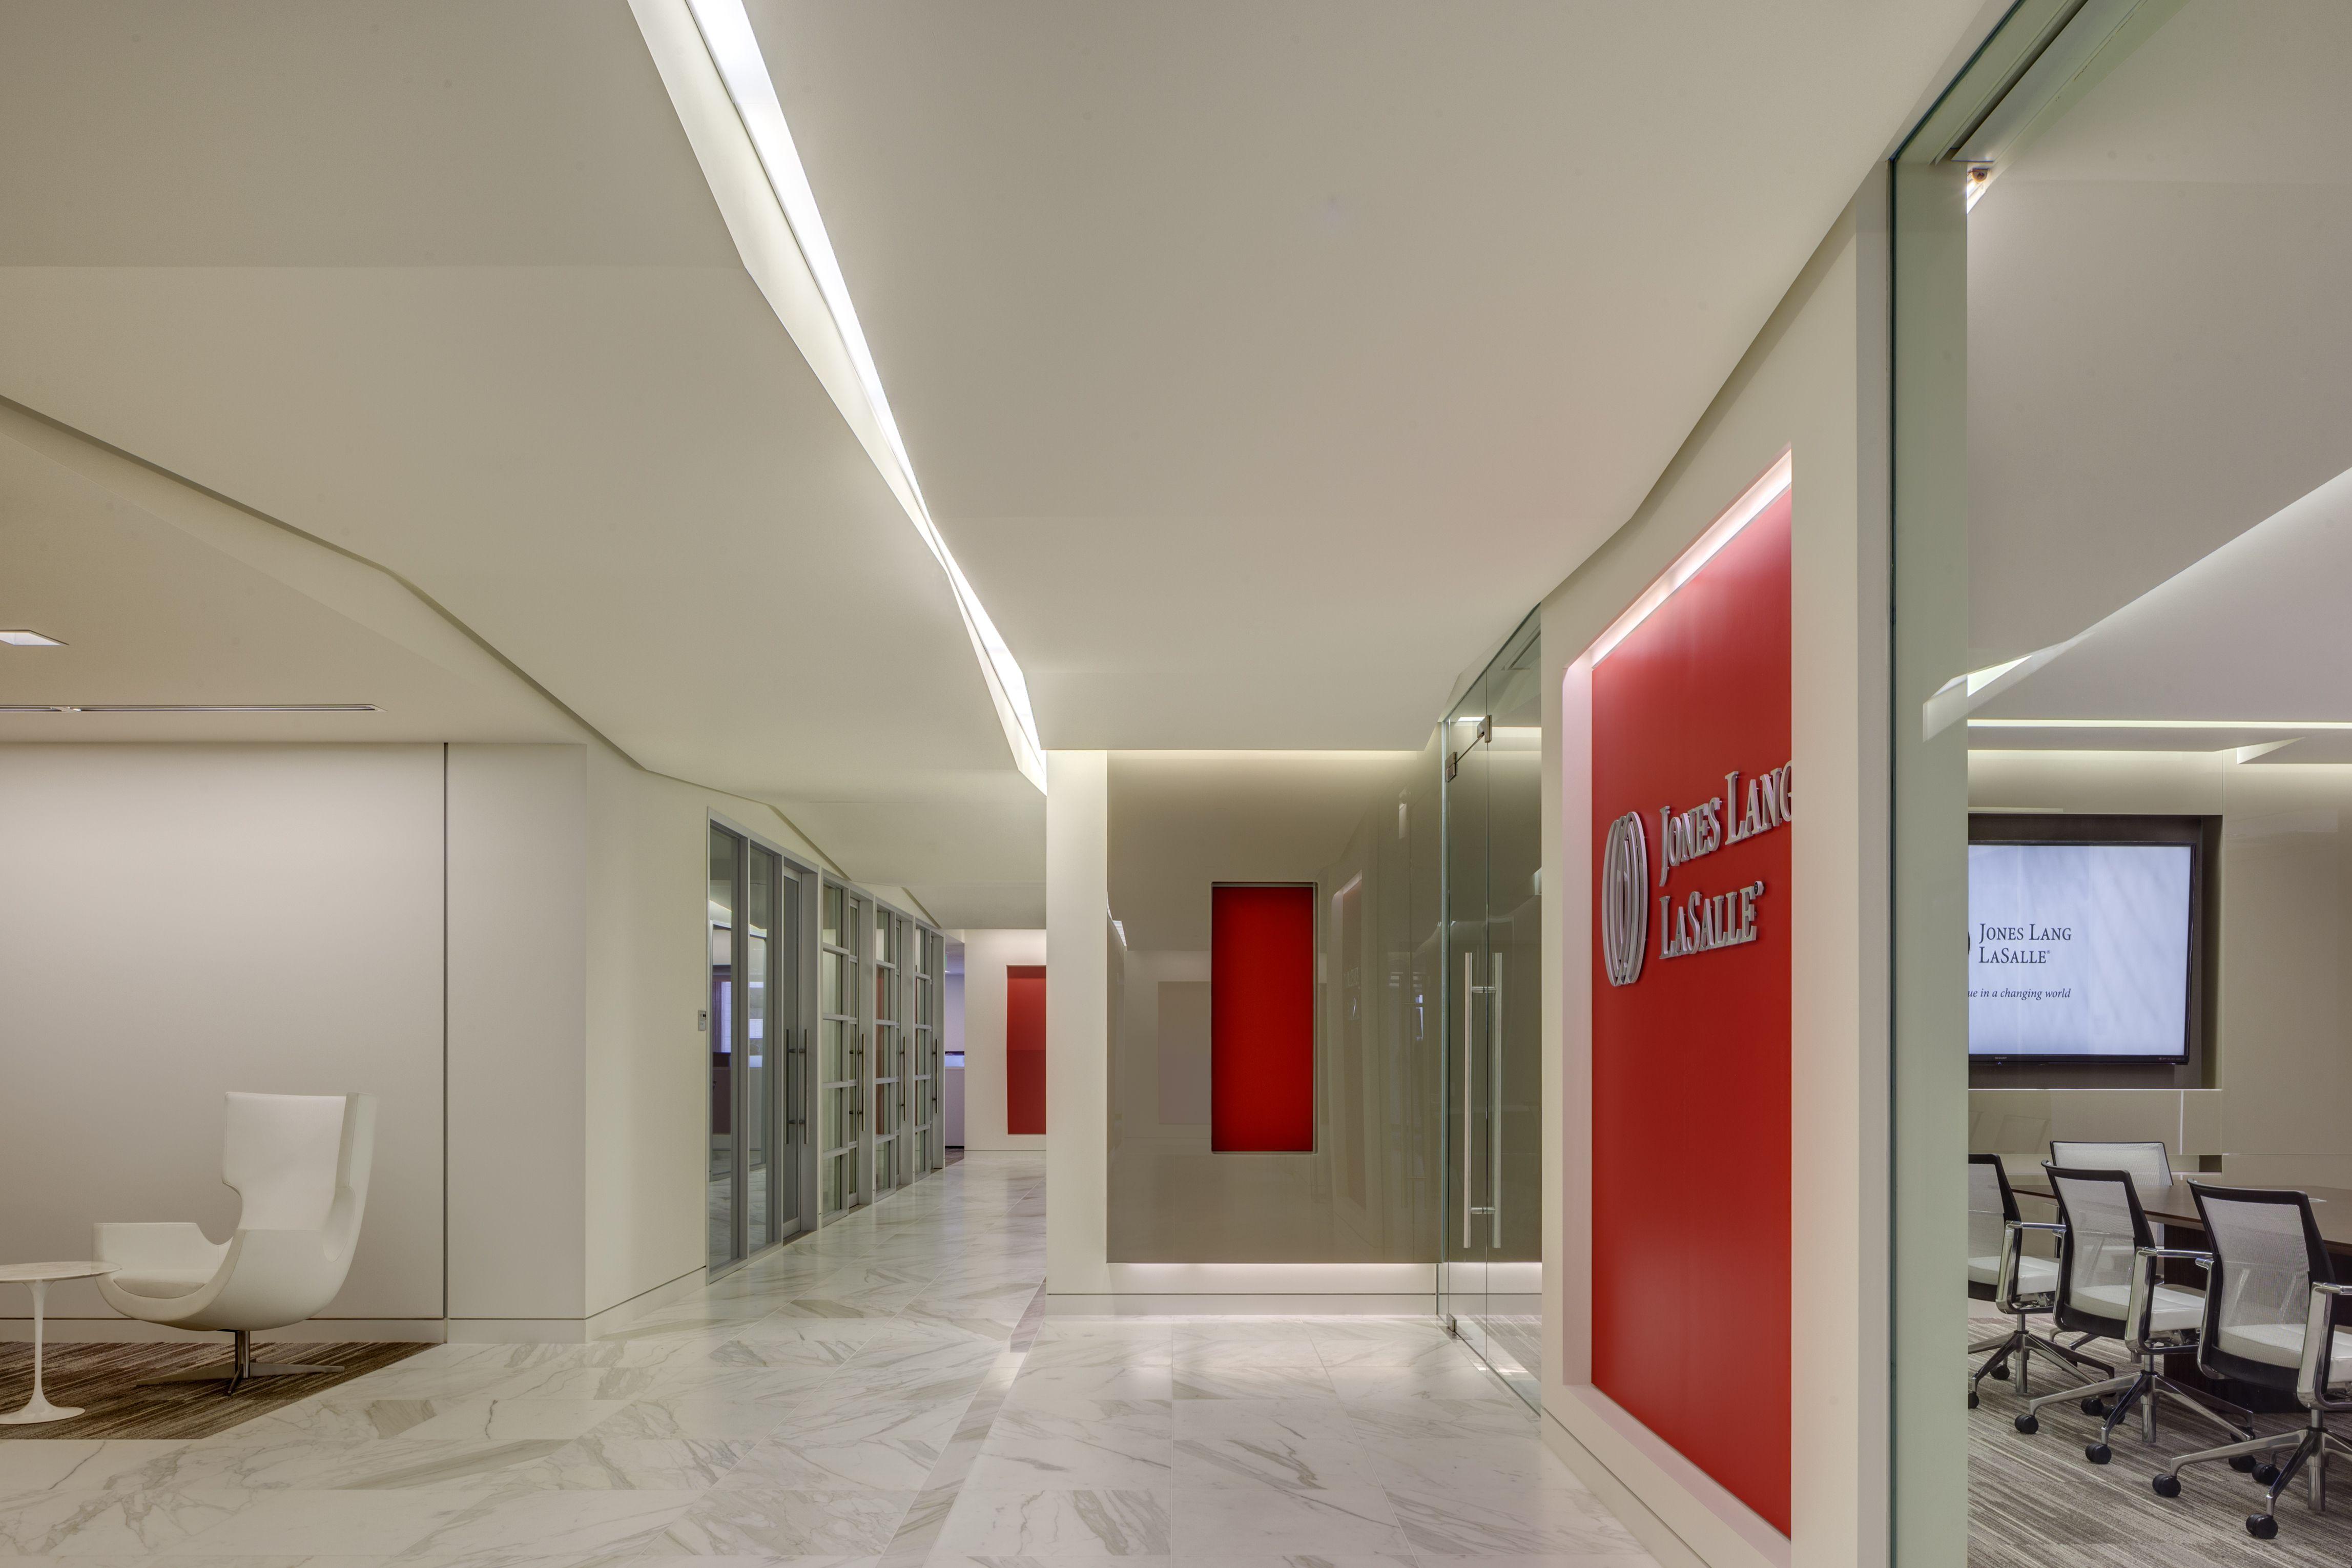 Jones Lang LaSalle Interior Design By HHendy Associates